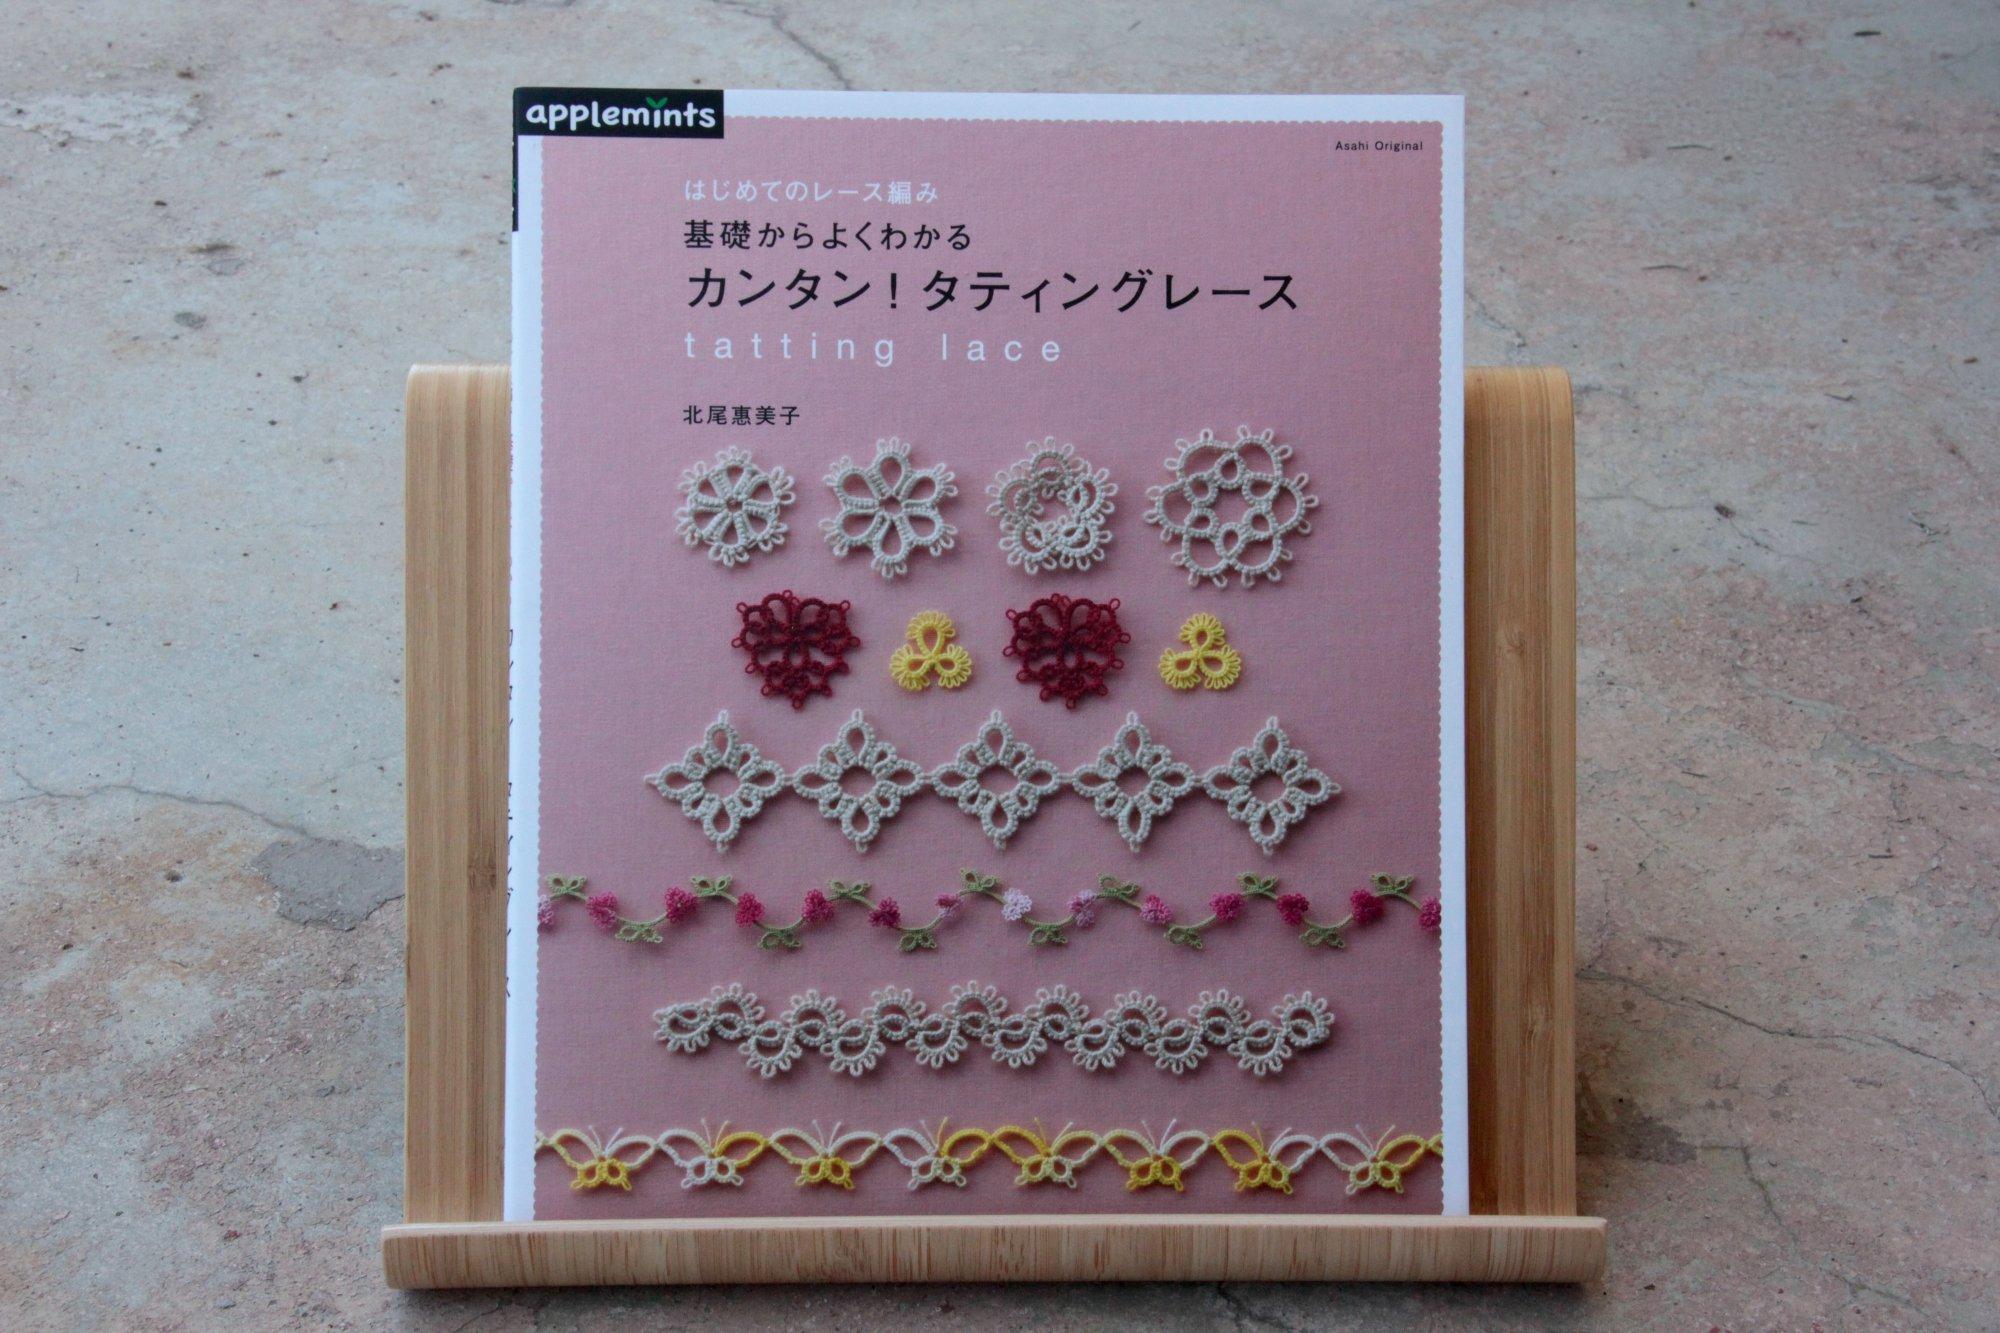 Applemints Tatting Lace Asahi Original (Japanese)